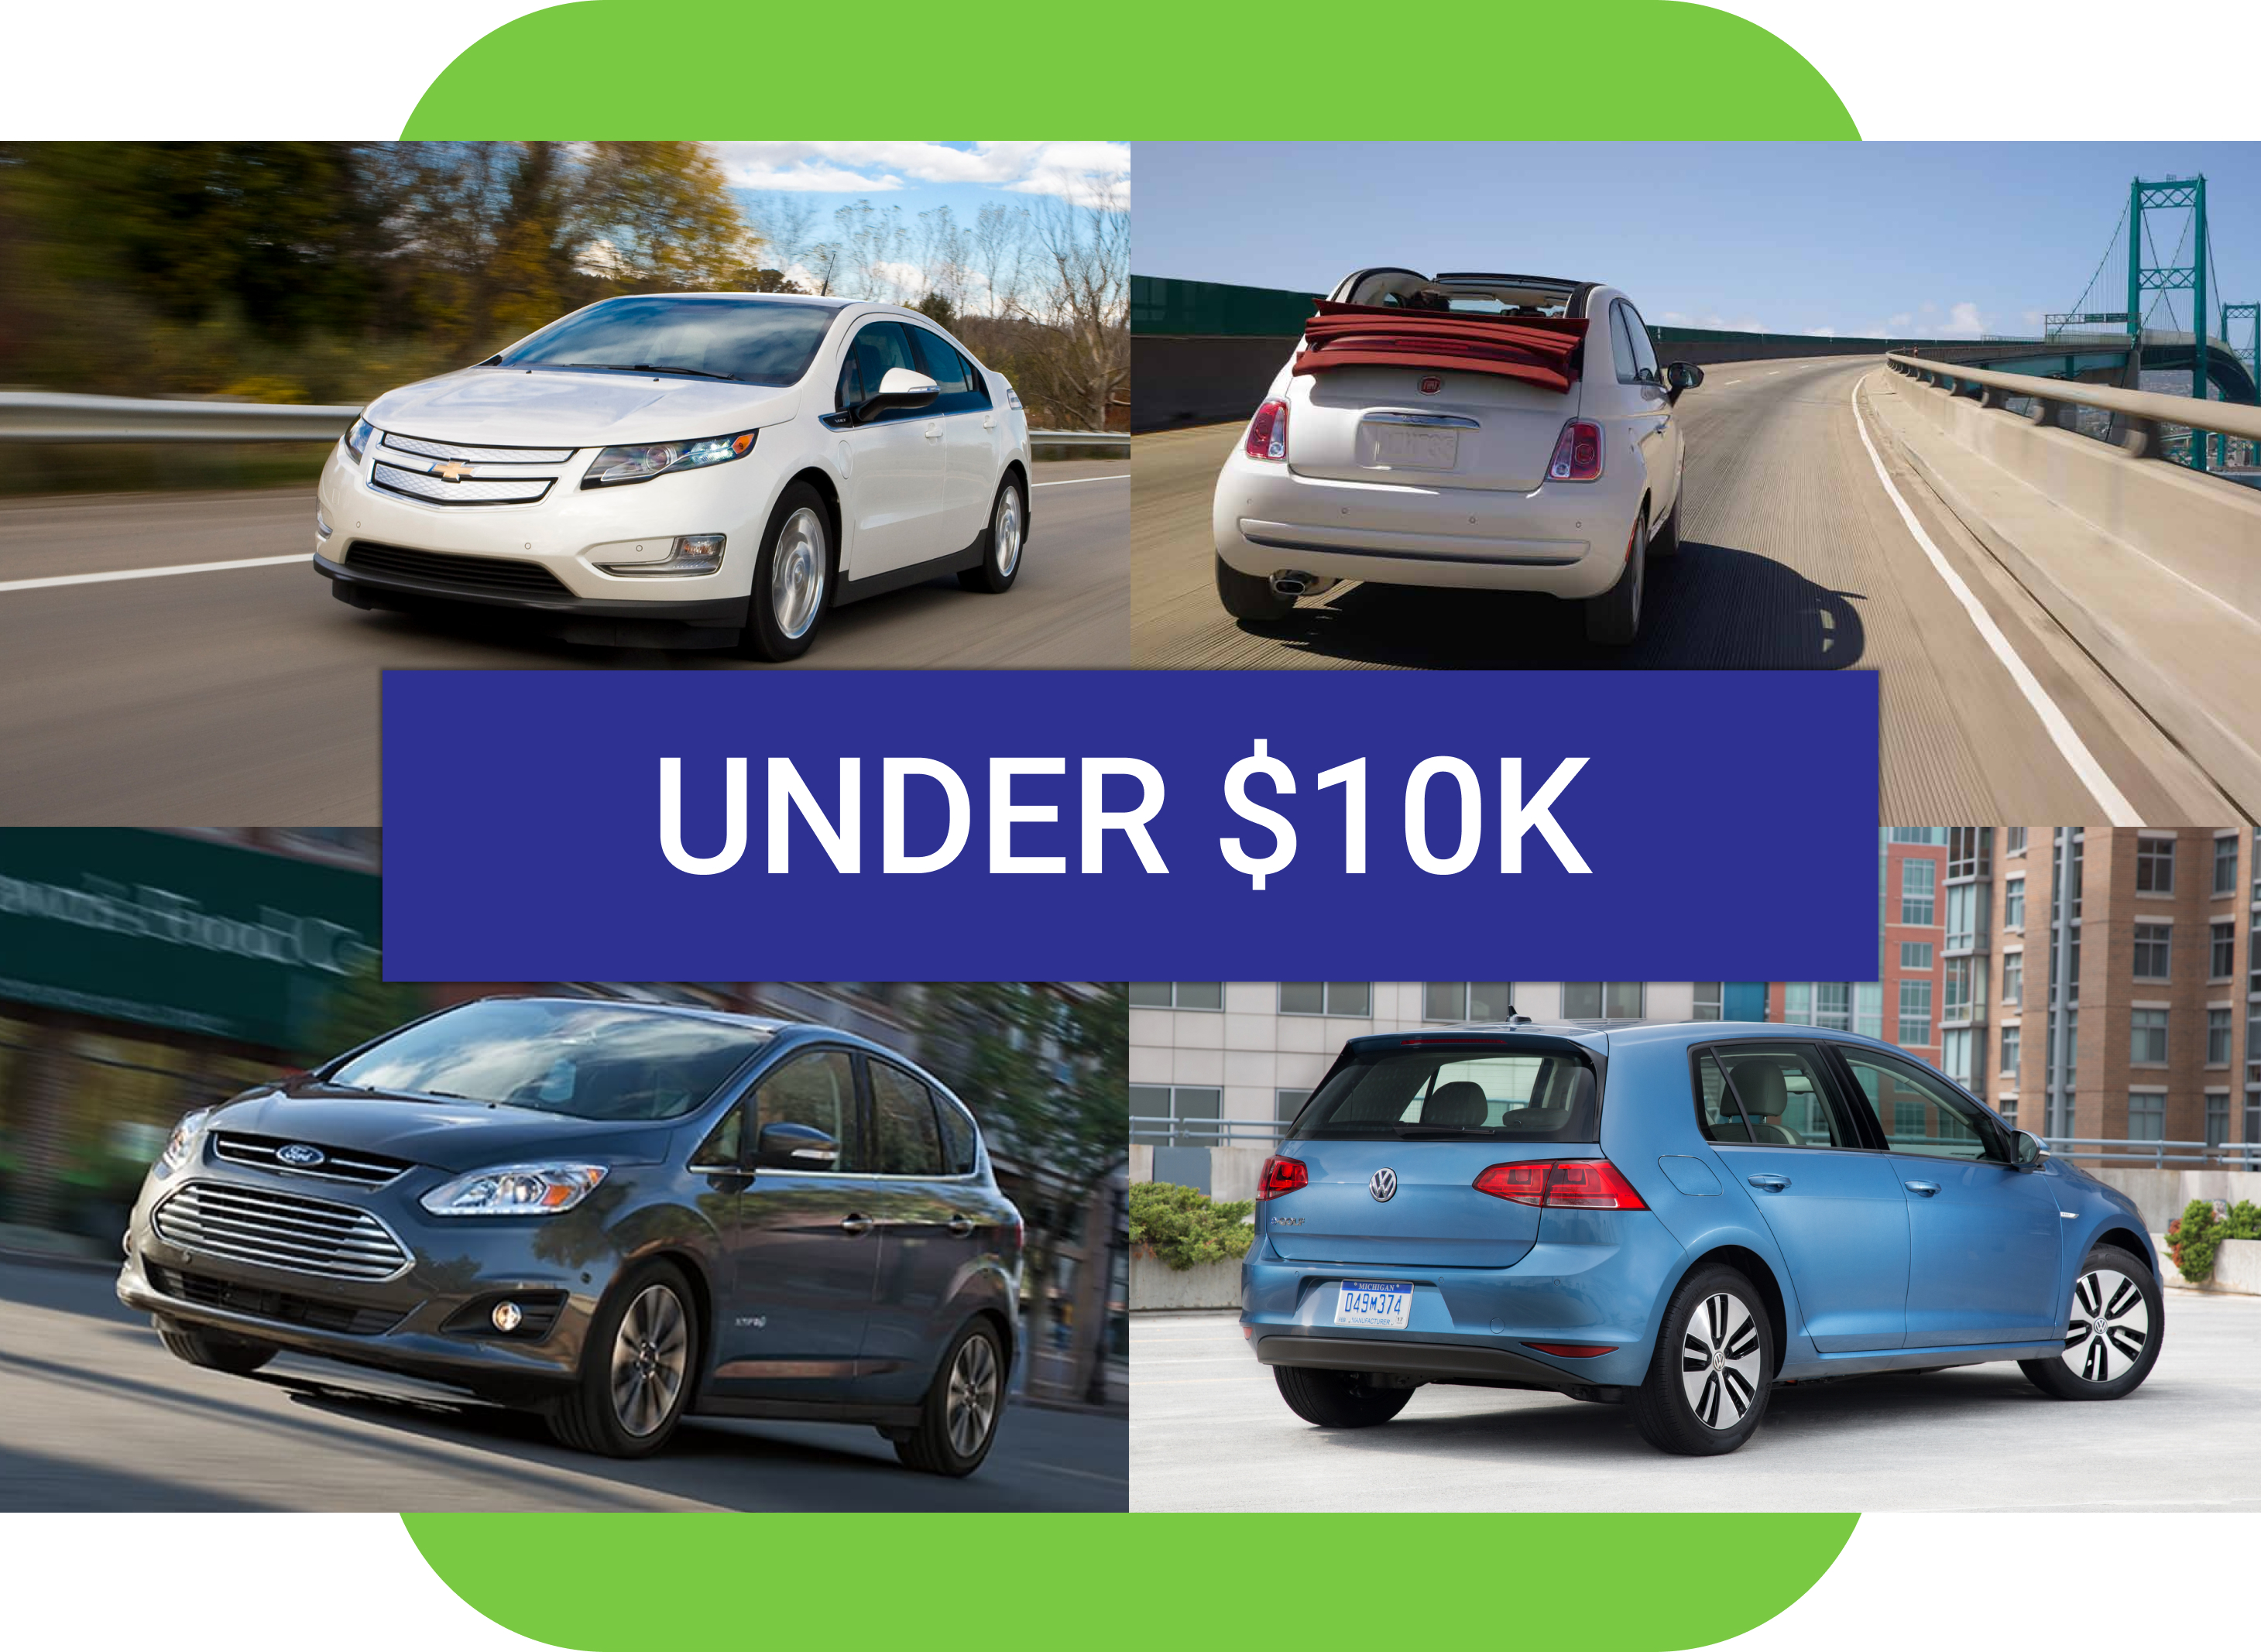 Best used EV under $10k